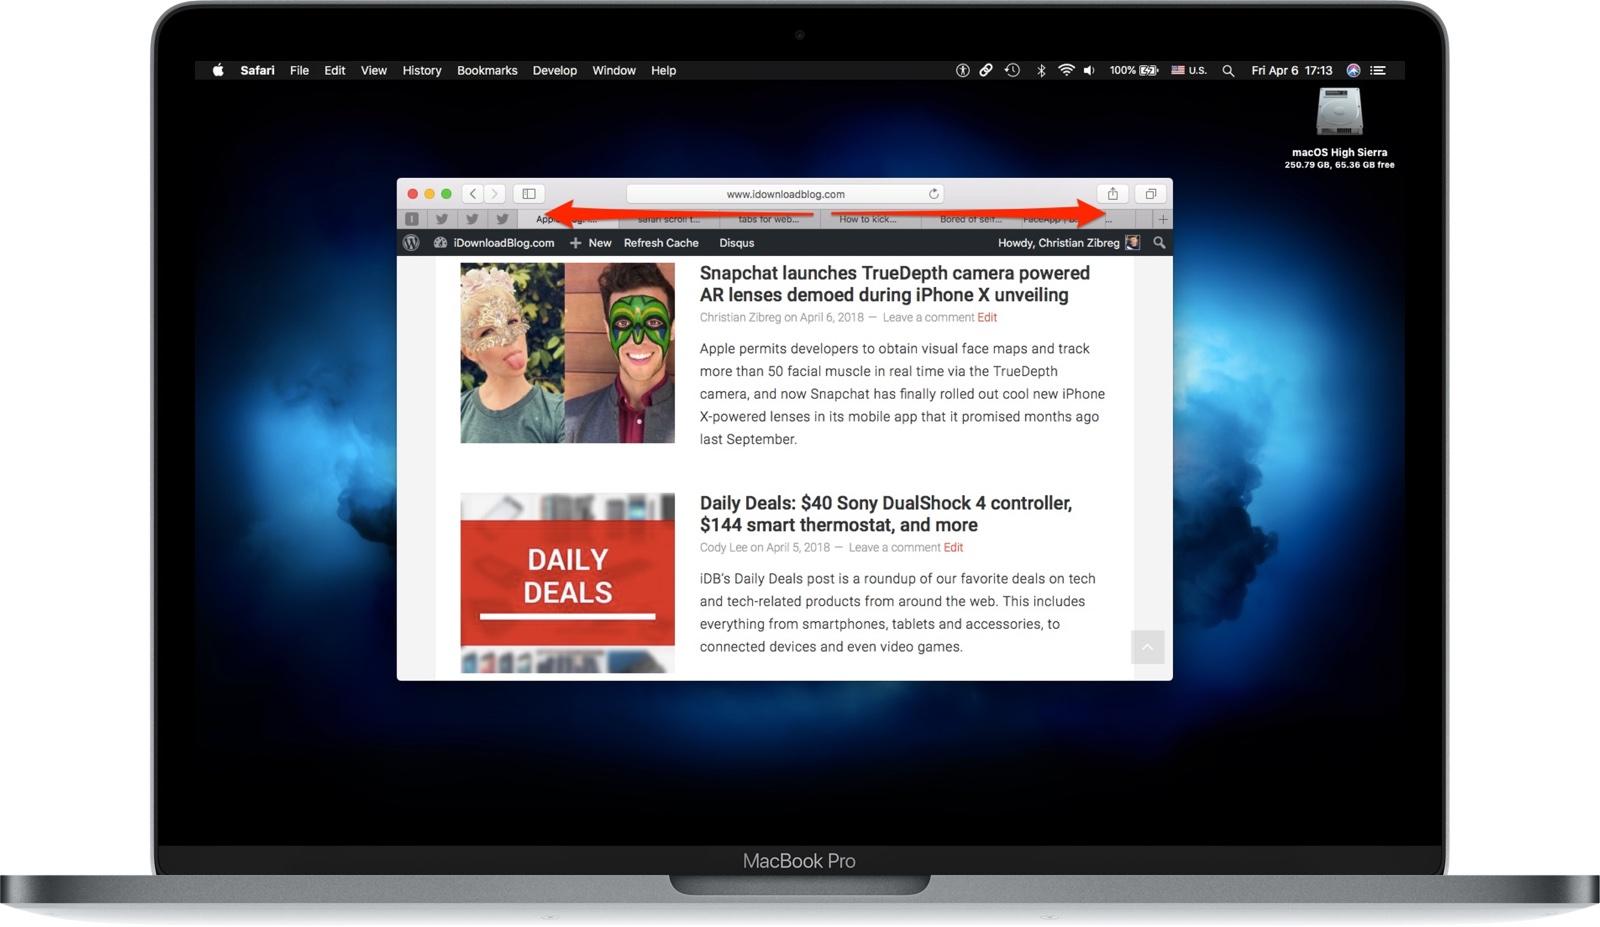 safari gestures on mac